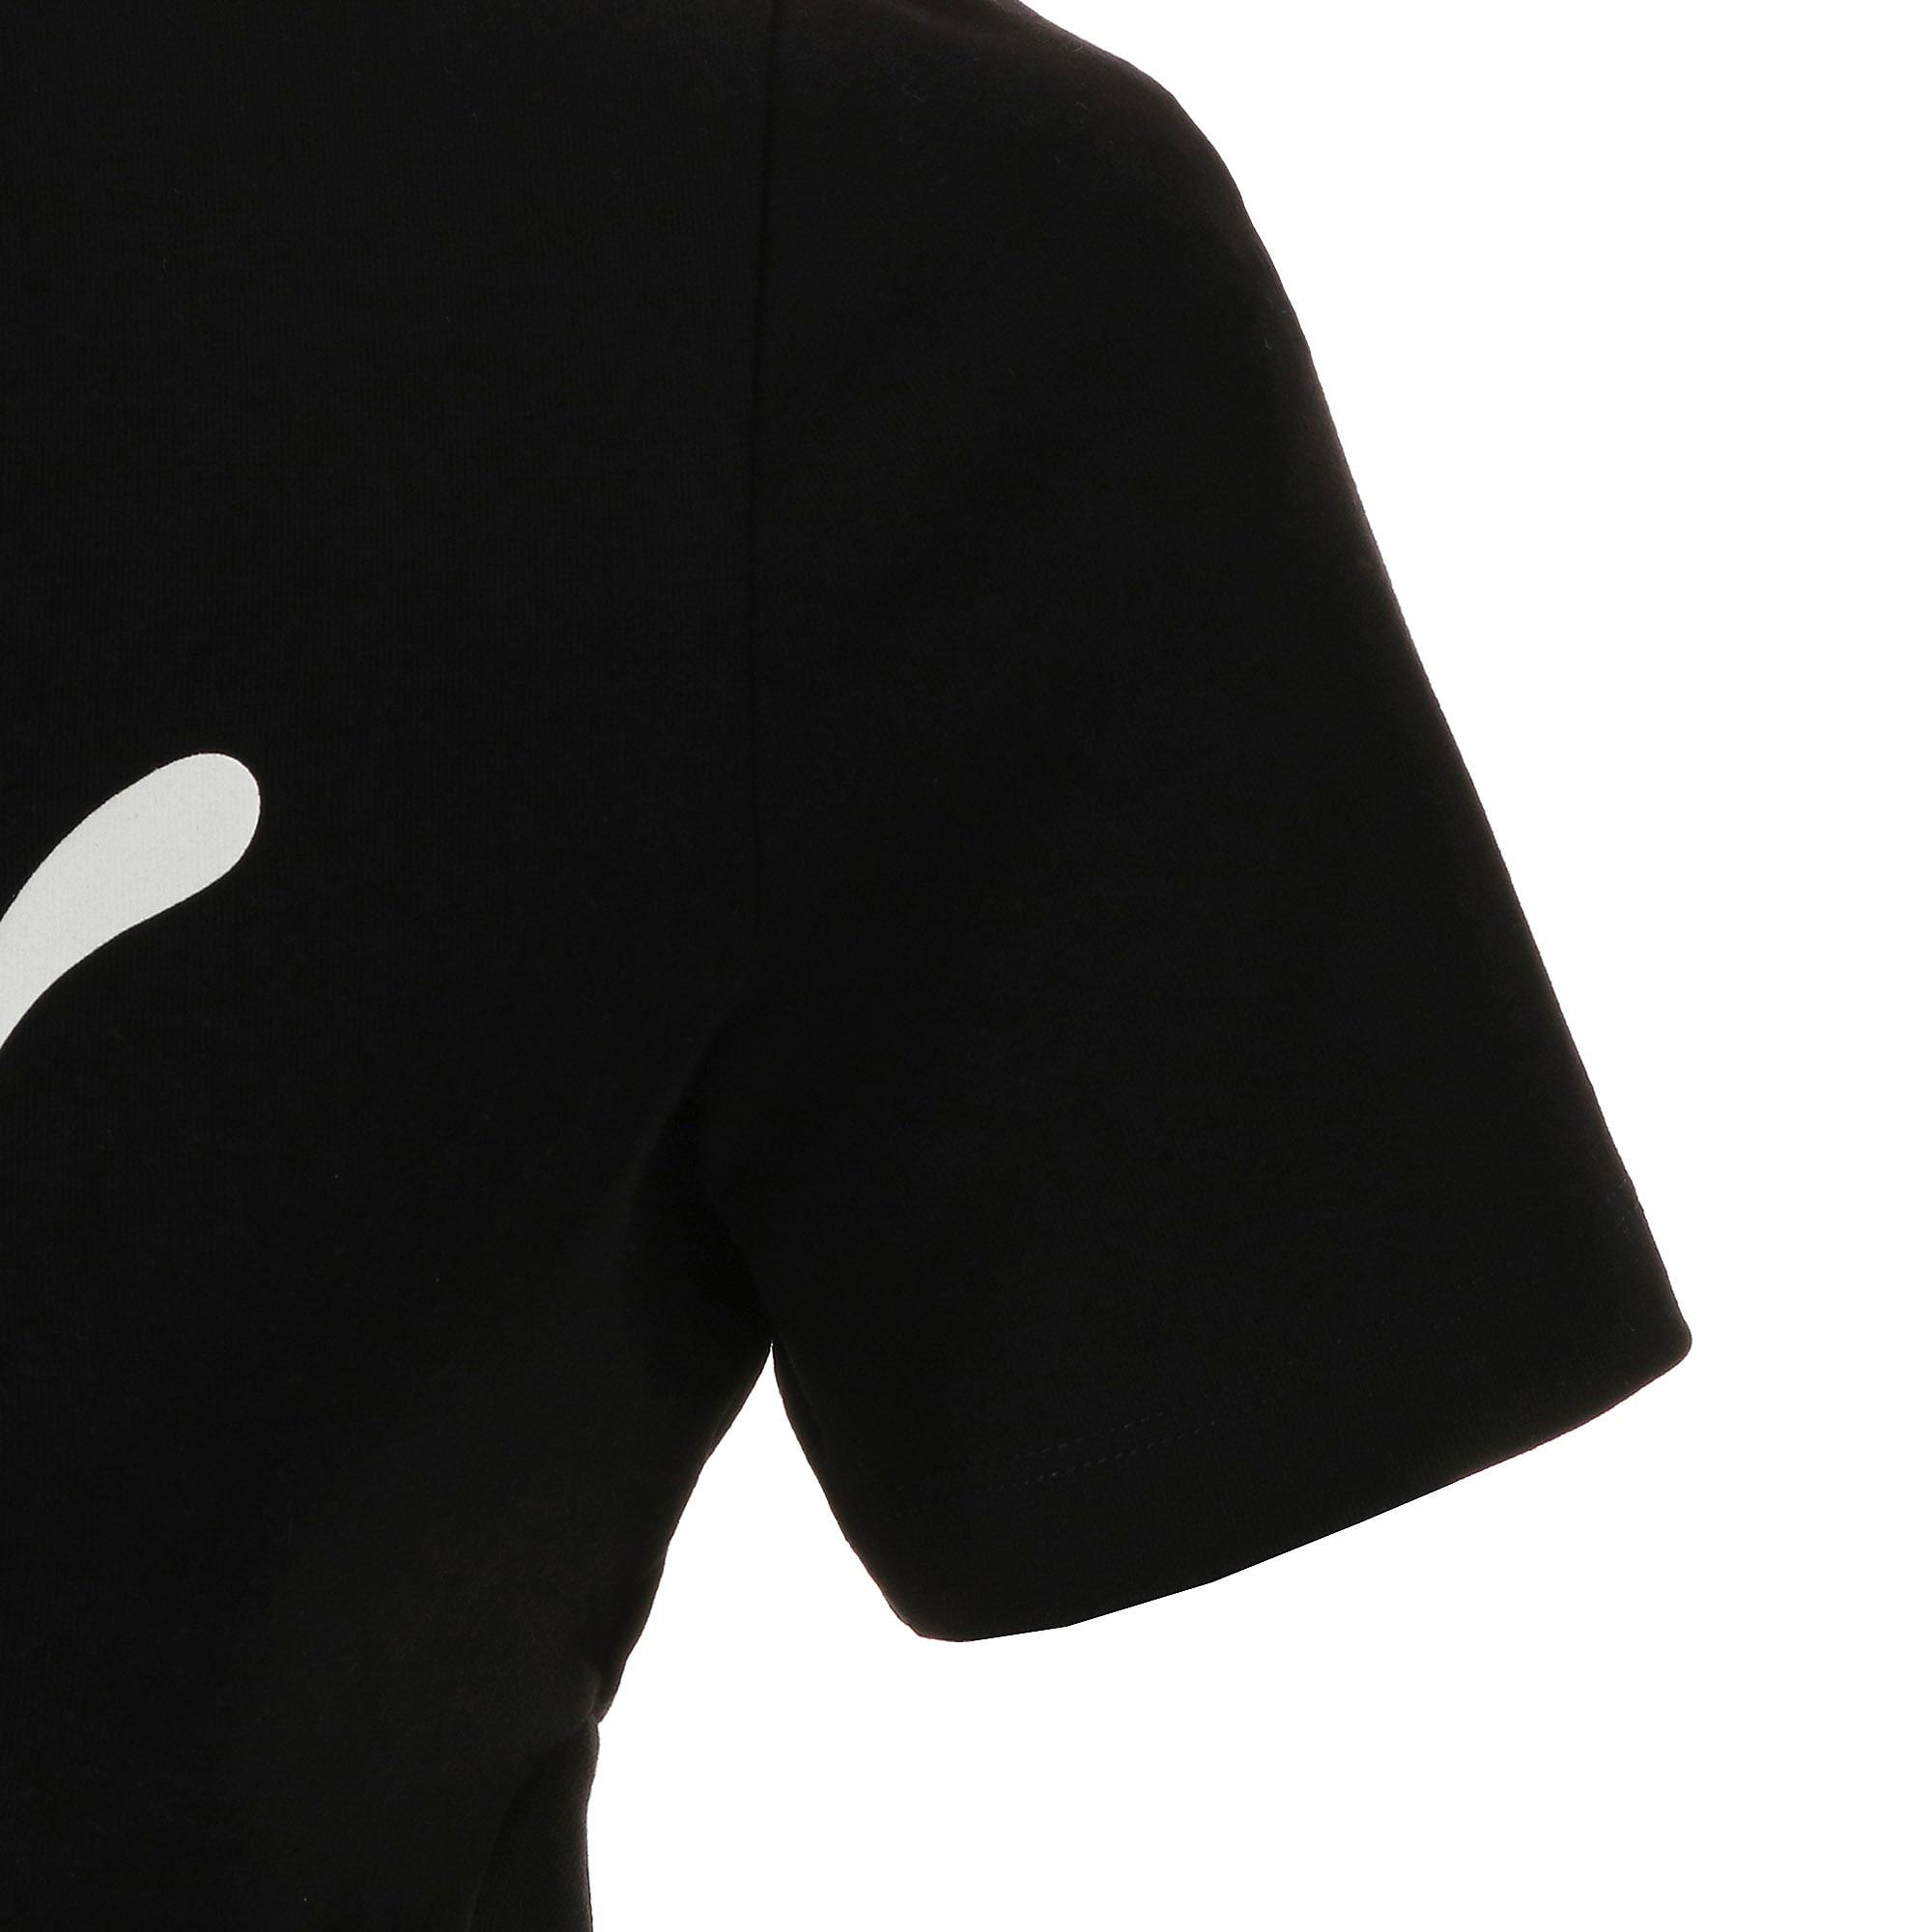 Thumbnail 8 of CLASSICS ウィメンズ ロゴ トップ, Cotton Black, medium-JPN